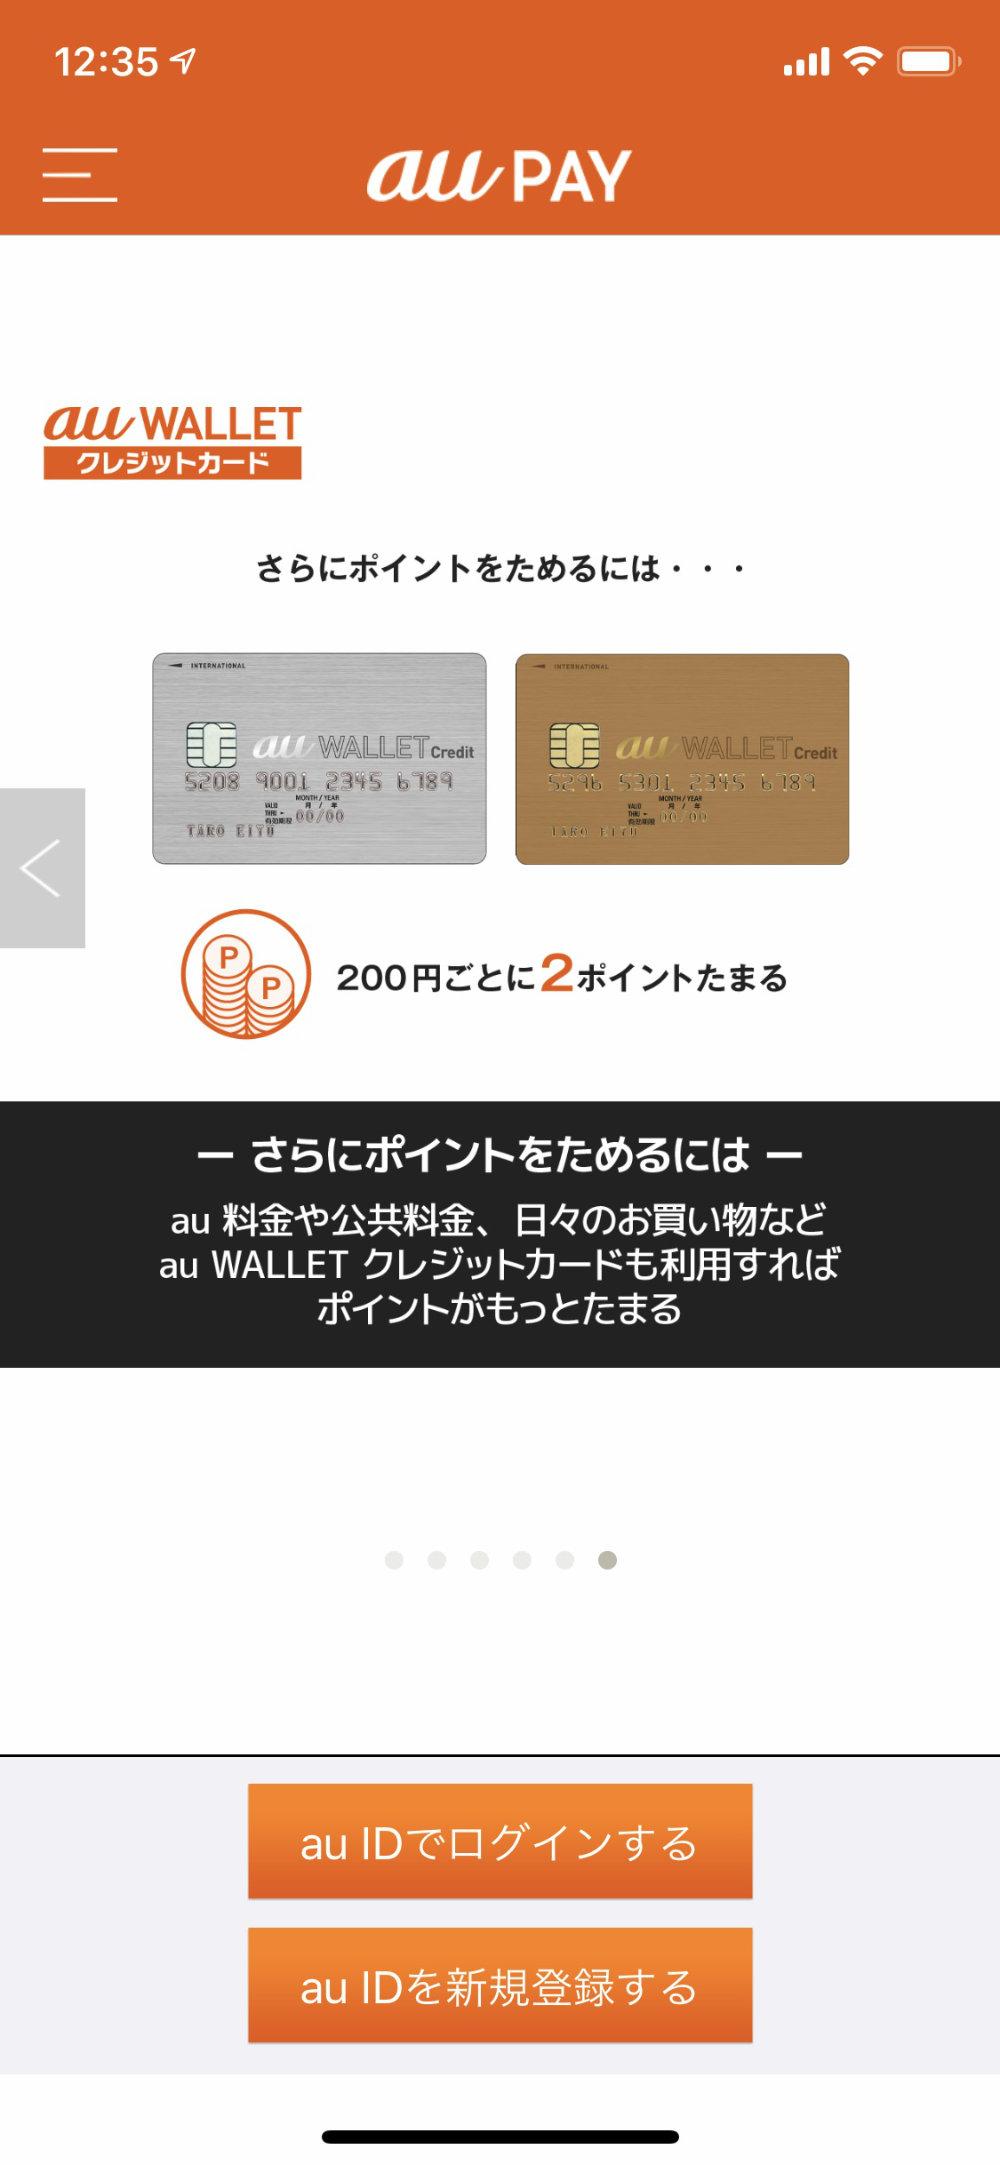 au ID登録完了後画面